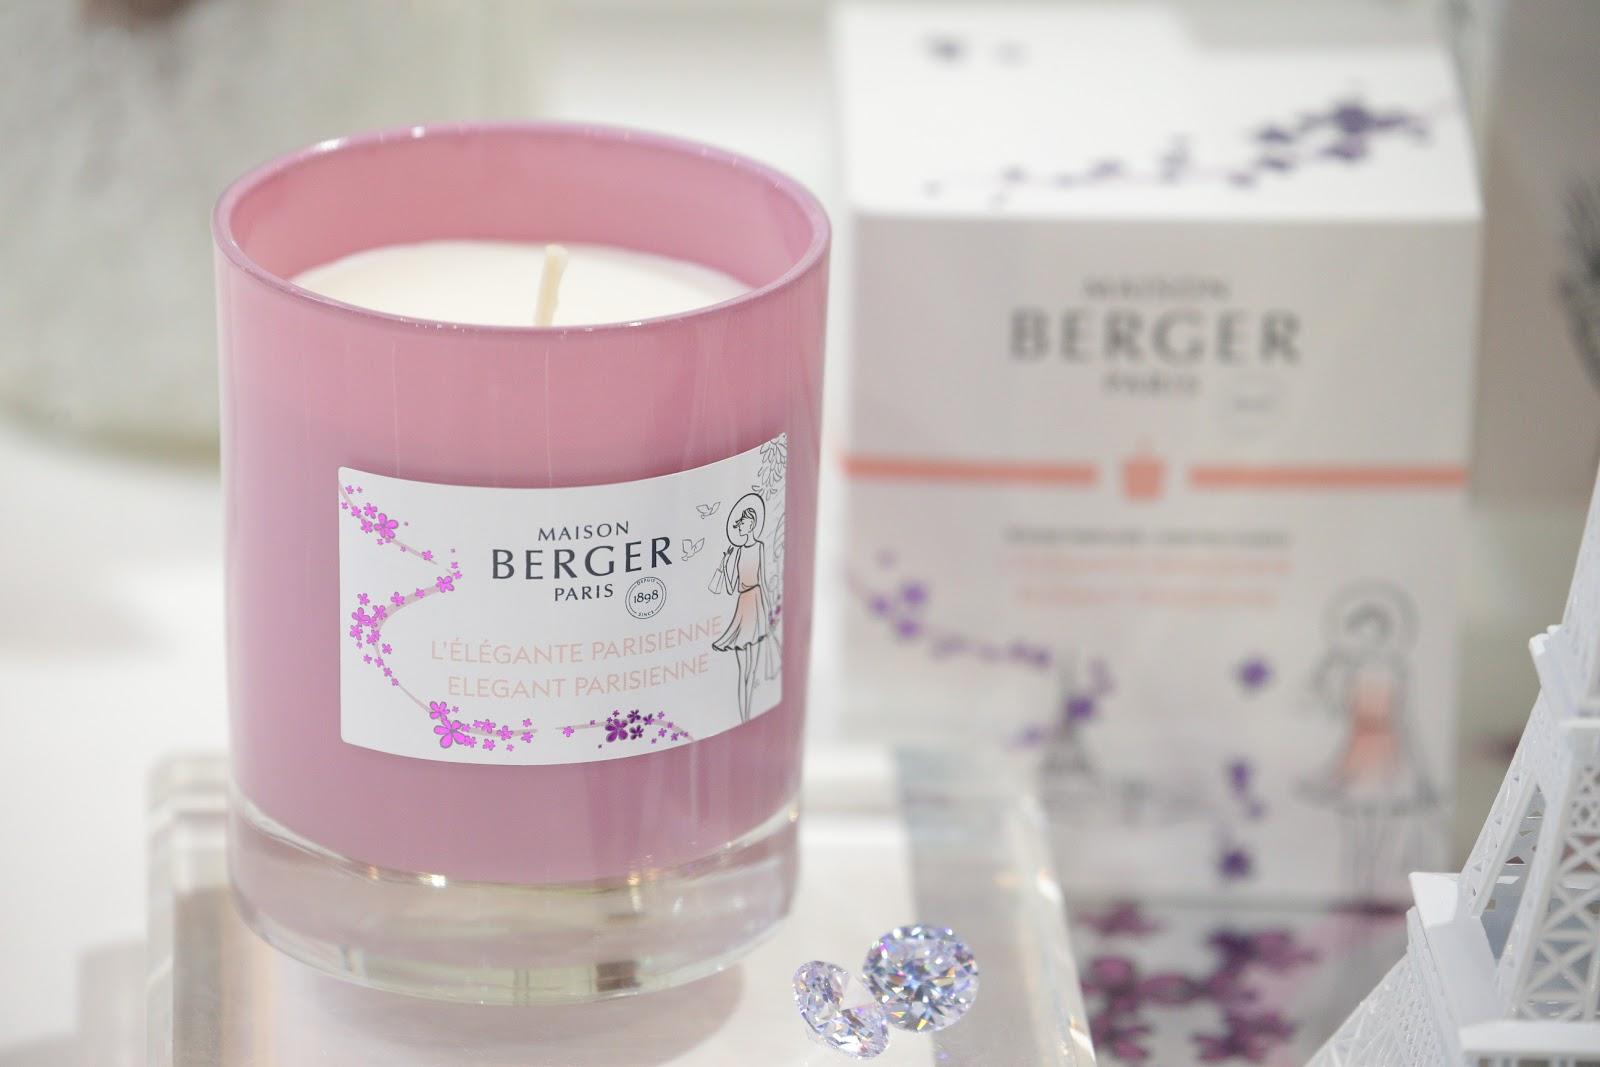 MAISON BERGER PARIS เทียนหอม SCENTED CANDLE กลิ่น ELEGANT PARISIENNE